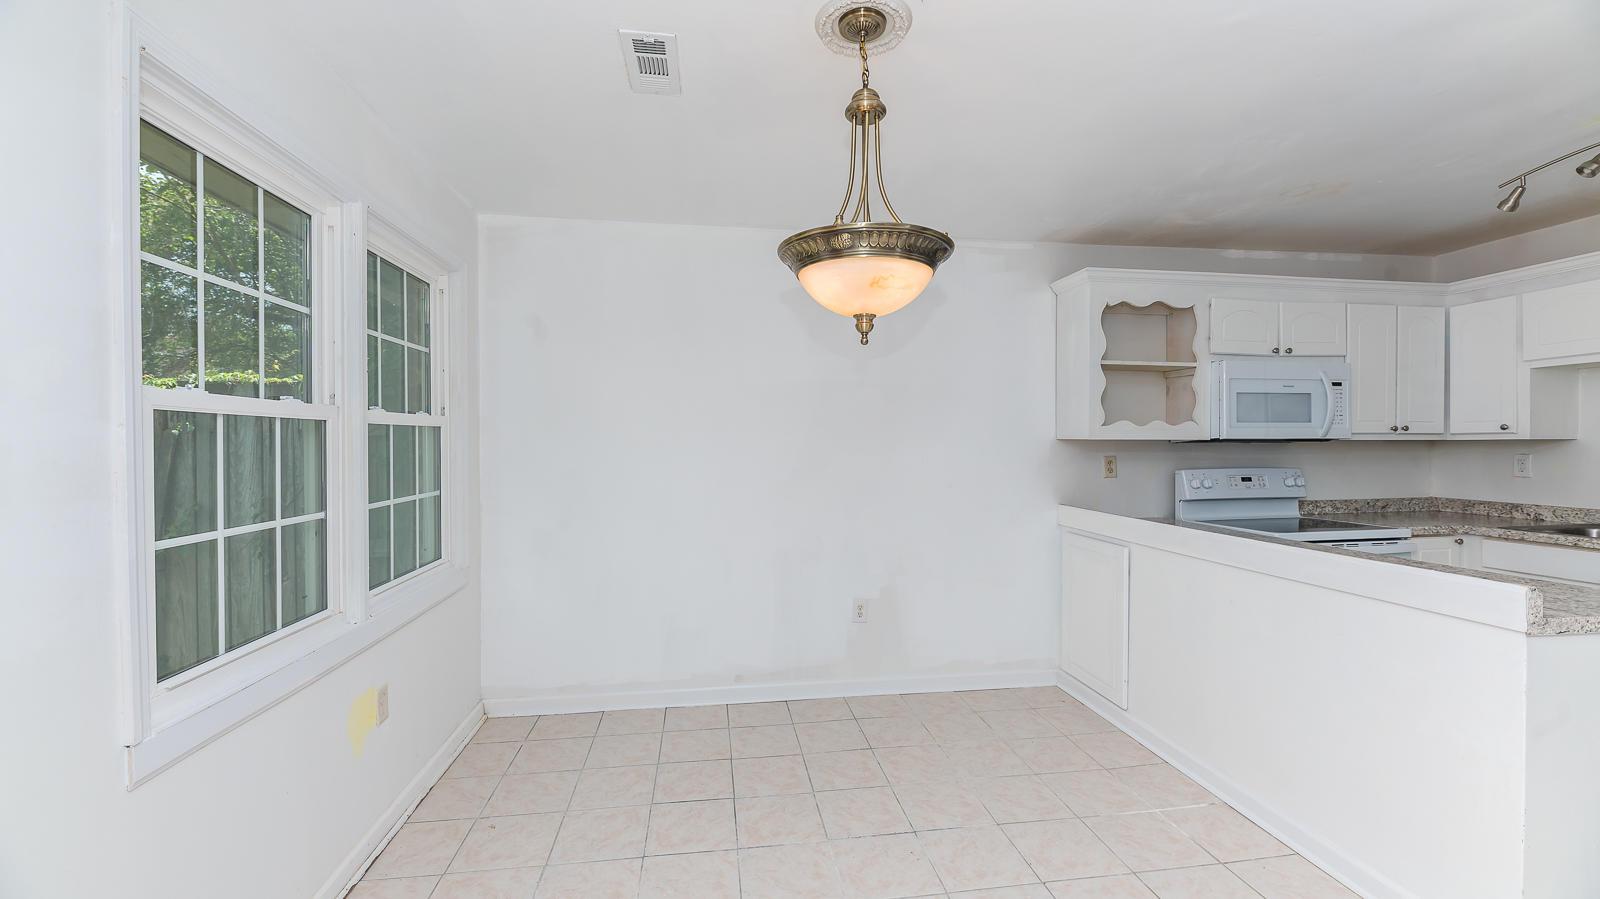 Ashley Villas Homes For Sale - 4315 Briarstone, North Charleston, SC - 23